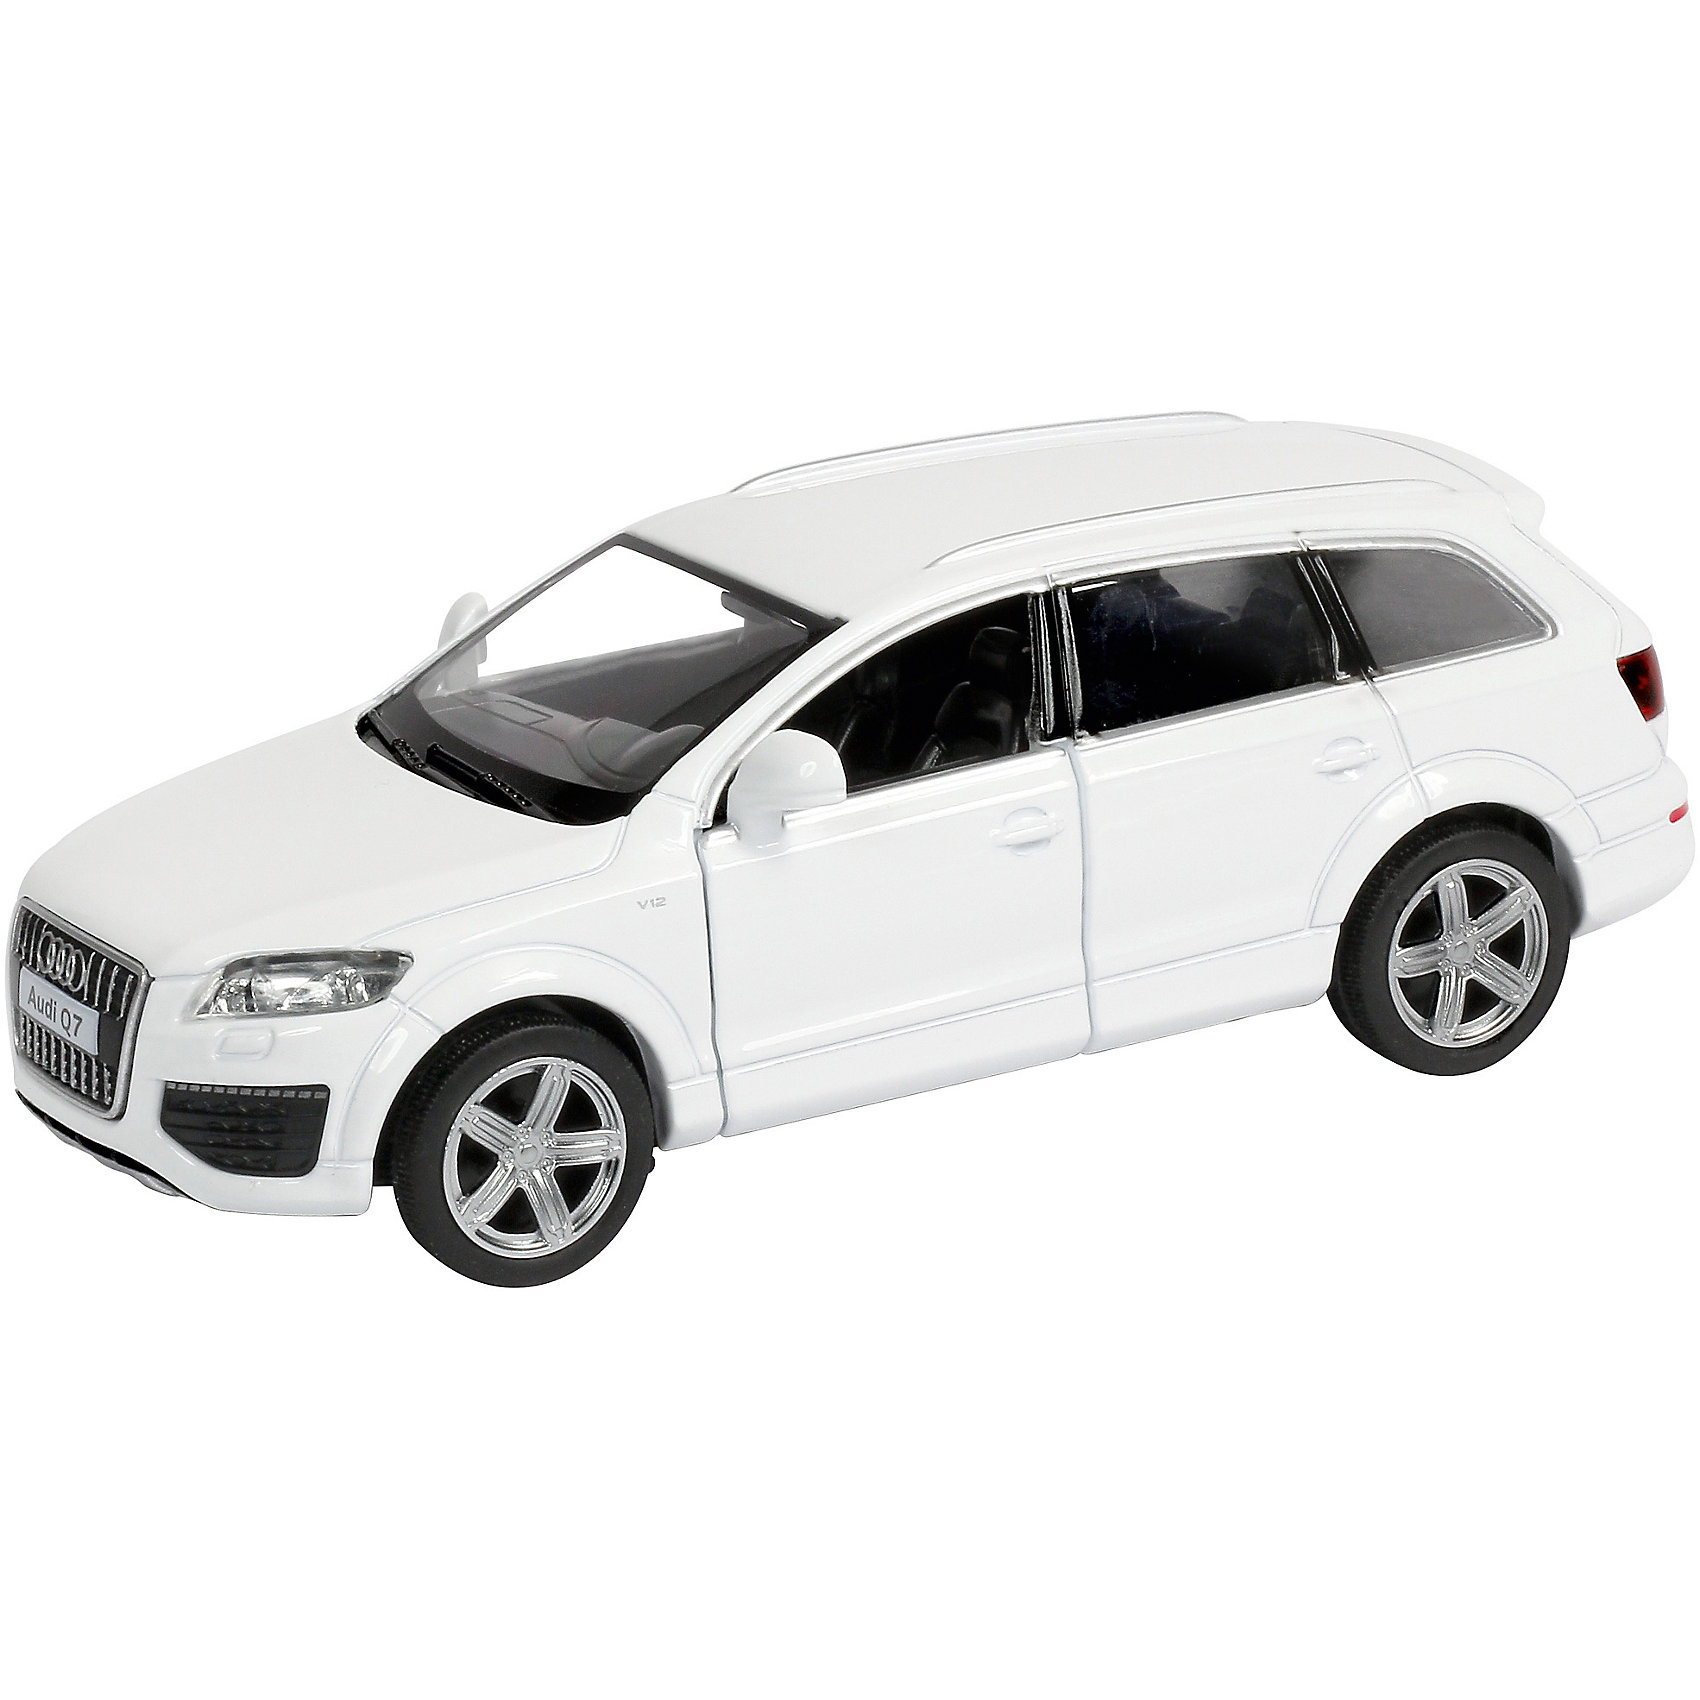 KRUTTI Машинка Audi Q7 V12, KRUTTI машина на радиоуправлении rastar audi q7 1 24